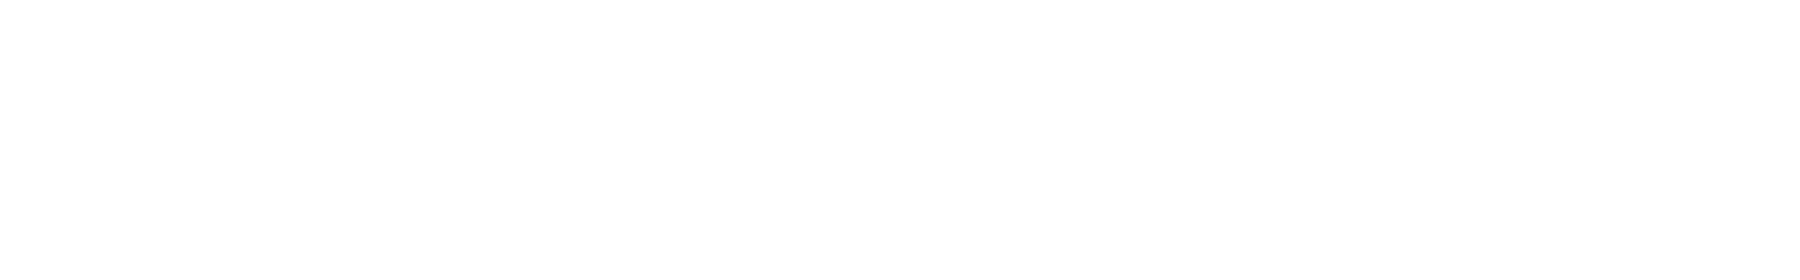 vedh melodyloop 018 cm a g 122bpm